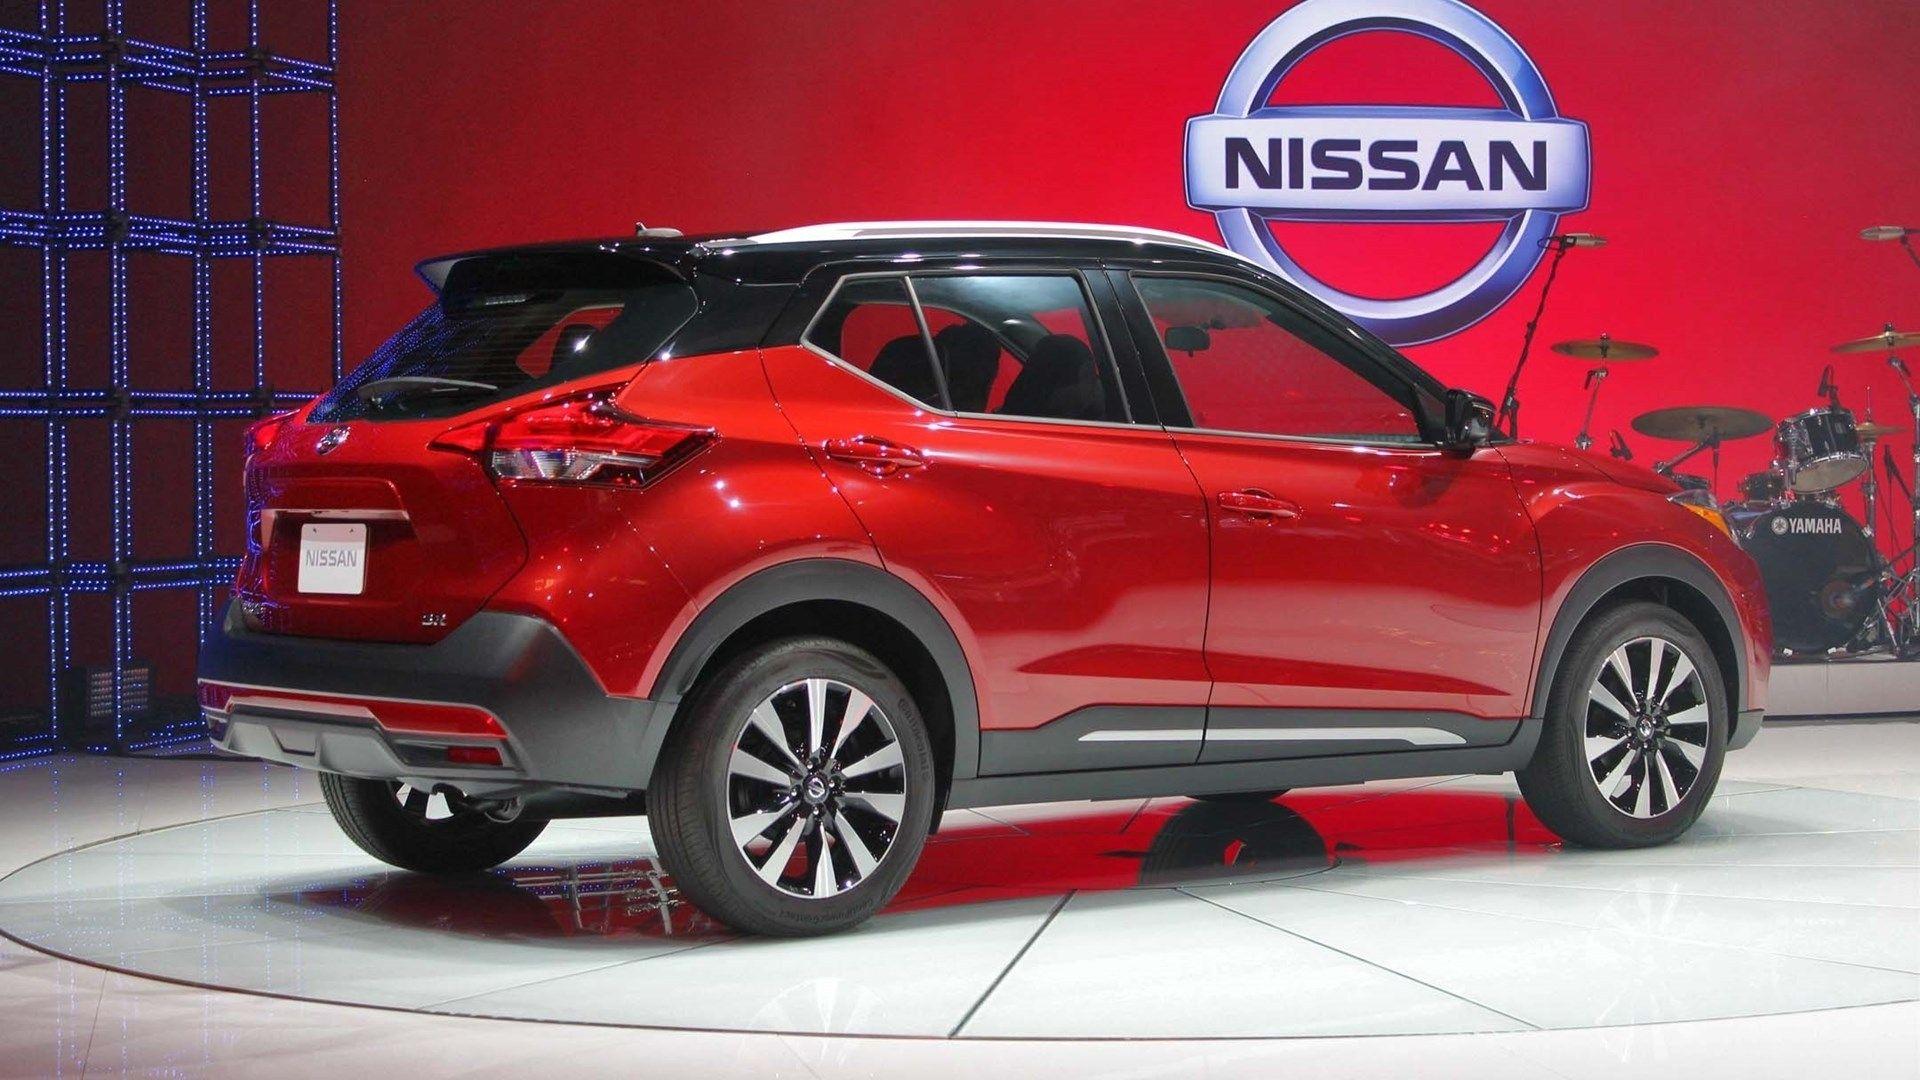 2020 Nissan Kicks Nismo Interior Changes, Engine Changes